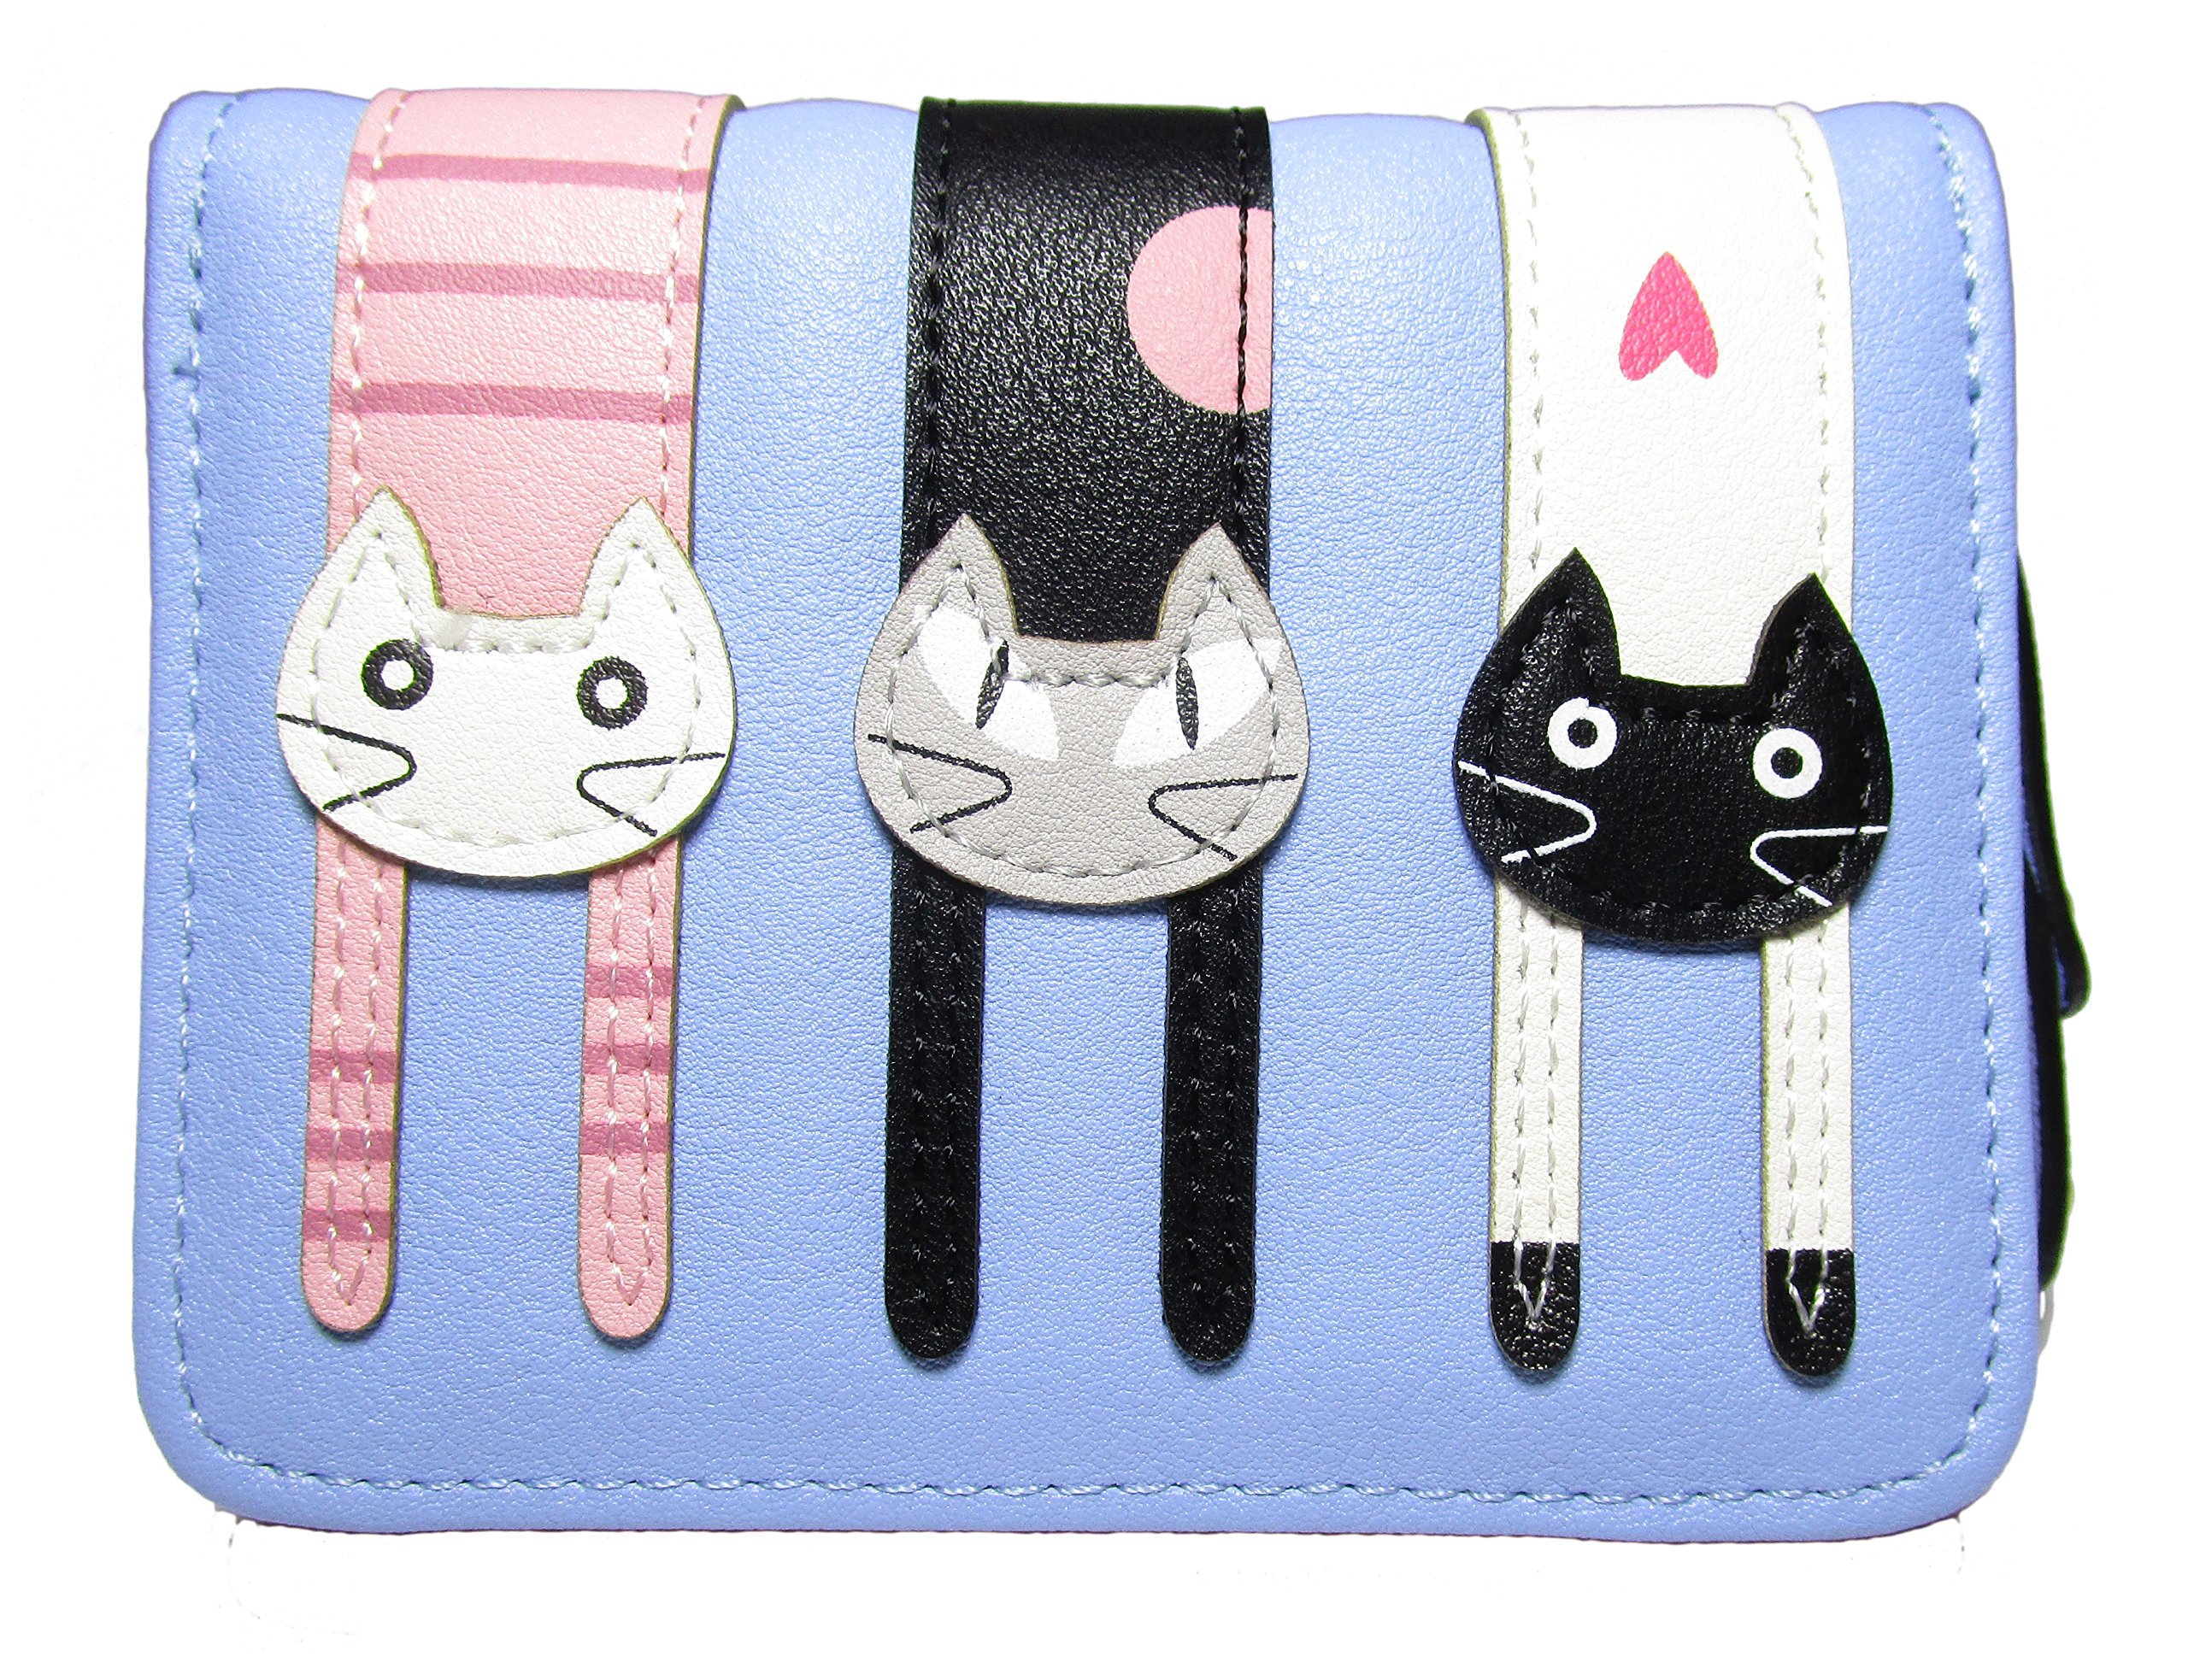 Nawoshow Women Cute Cat Wallet Coin Purse Bifold Wallet Clutch Bag (Blue)